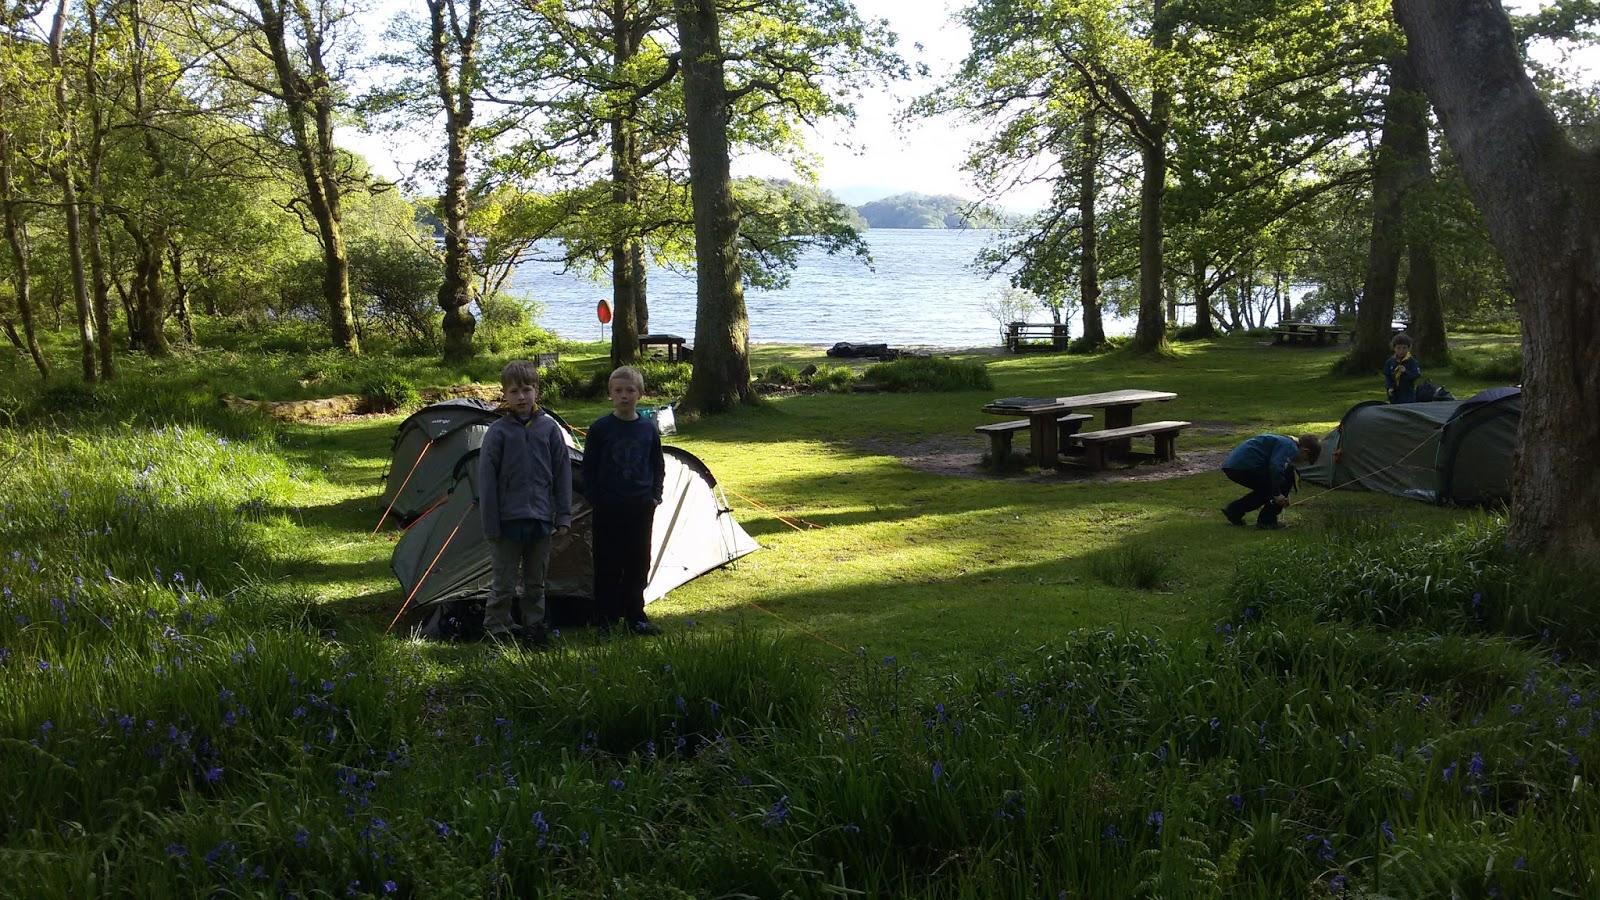 Camping Islands Loch Lomond an Island on Loch Lomond